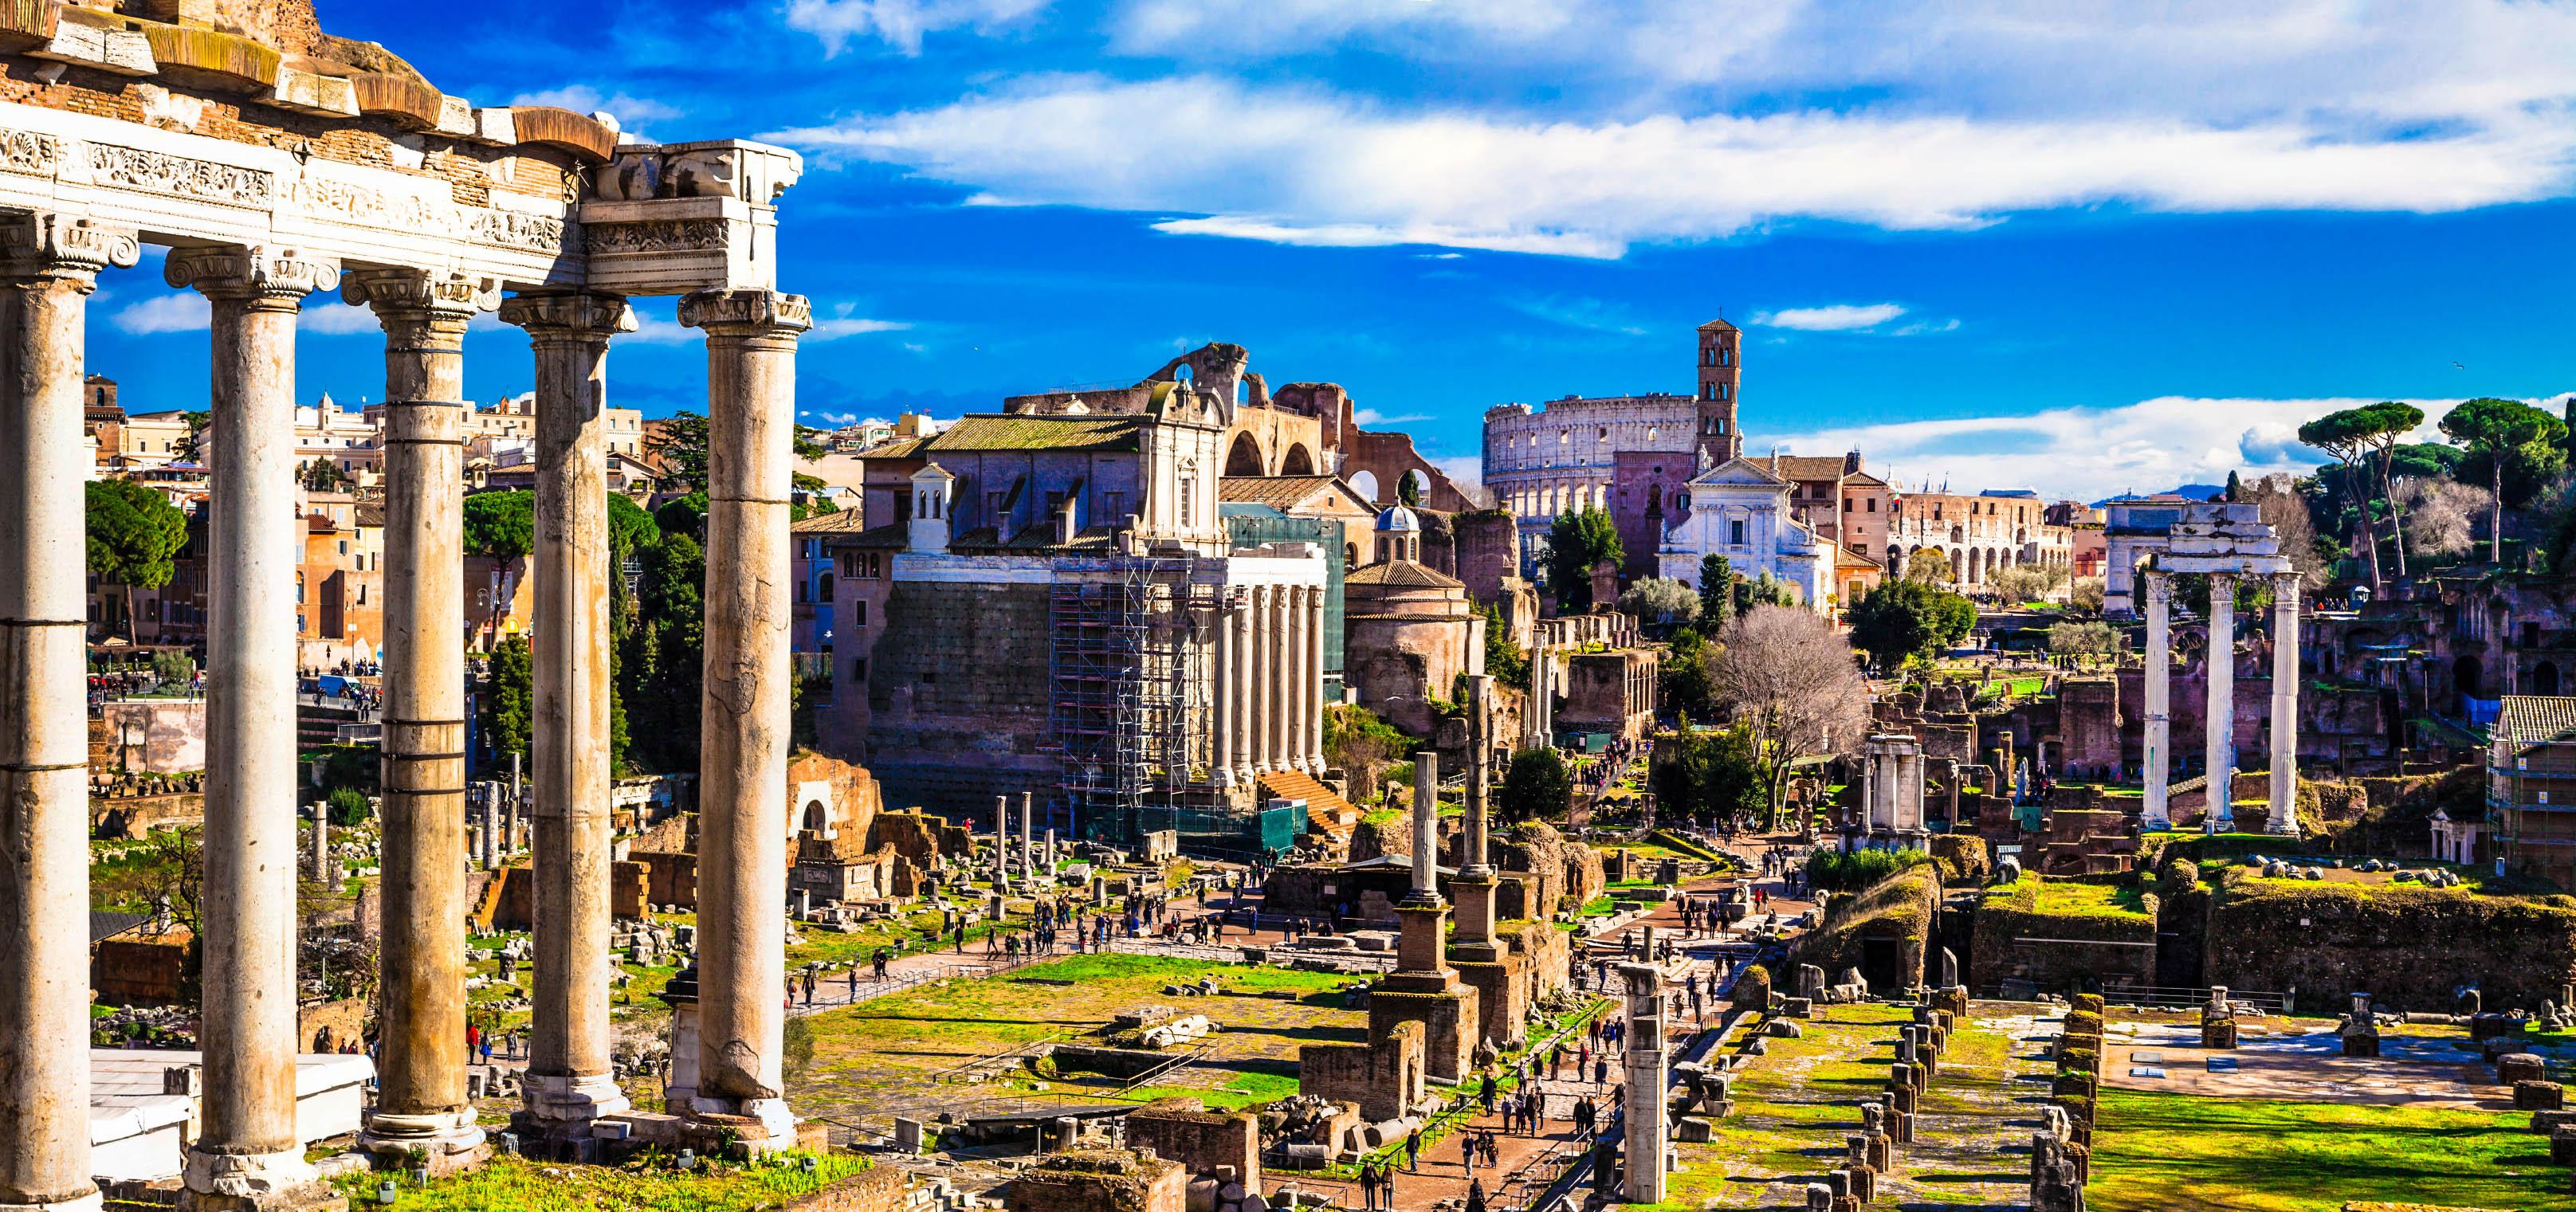 Edreams Hotel Roma